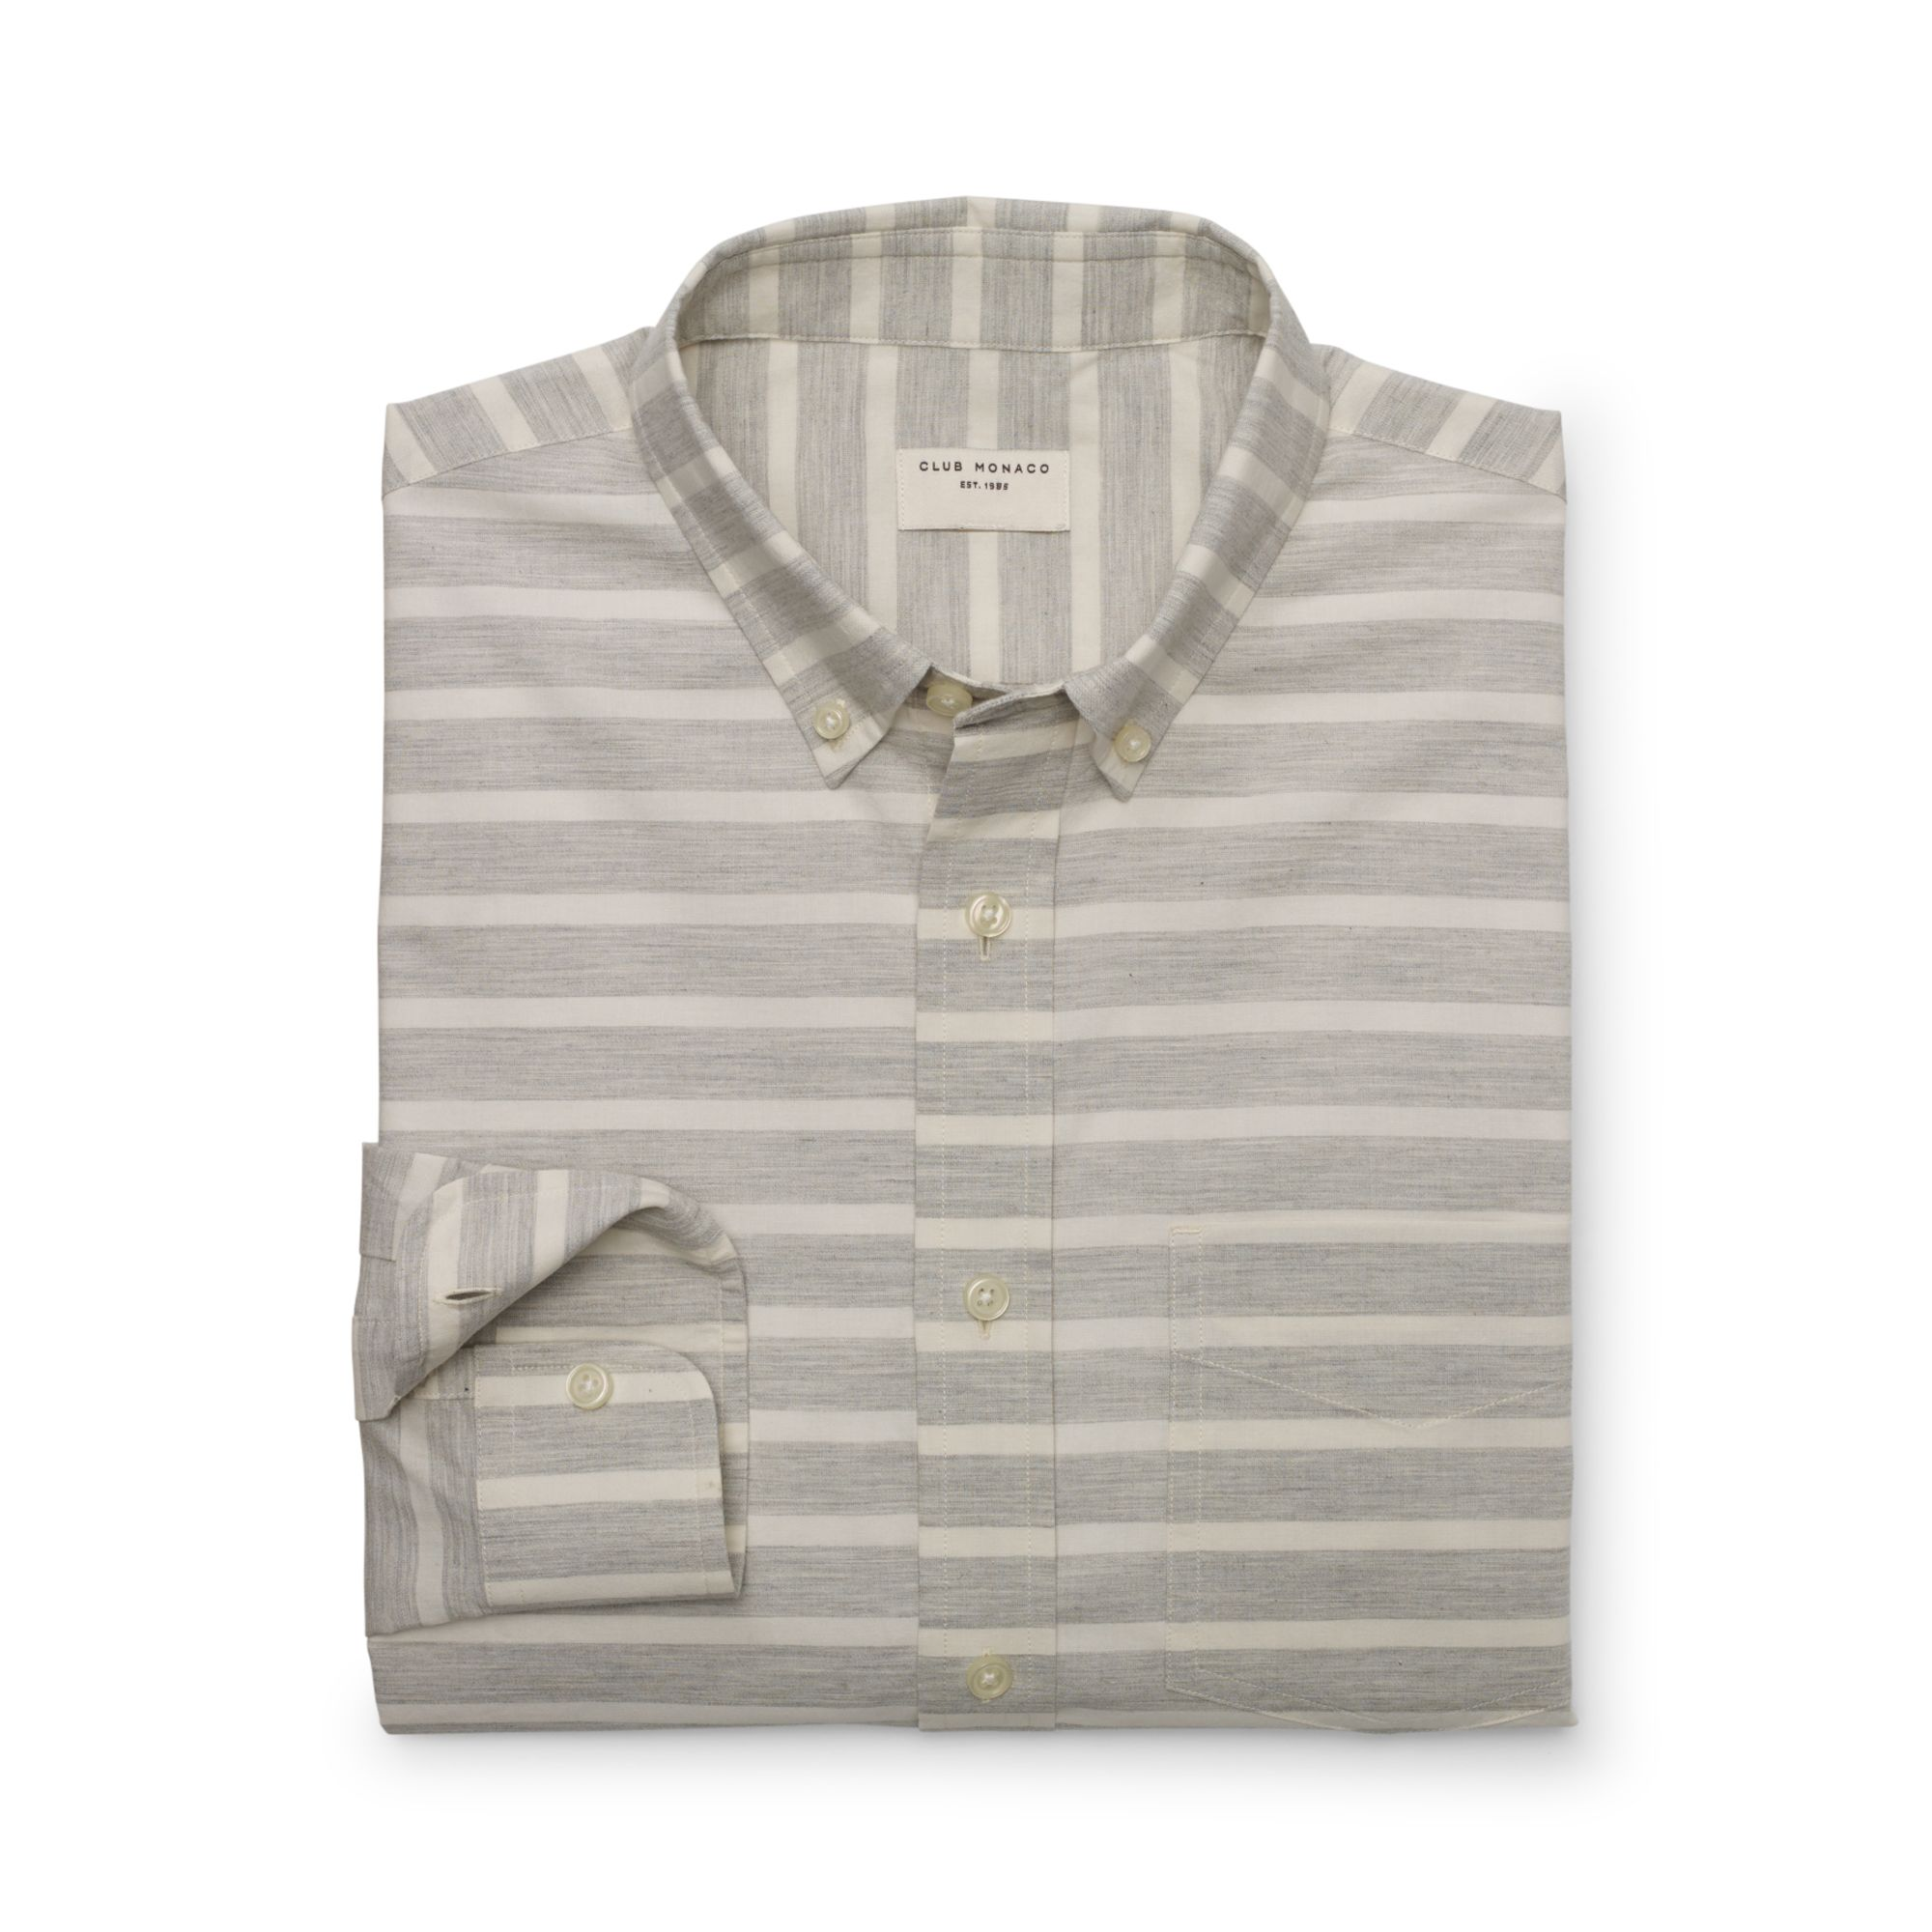 Club monaco slimfit striped shirt in gray for men grey for Horizontal striped dress shirts men